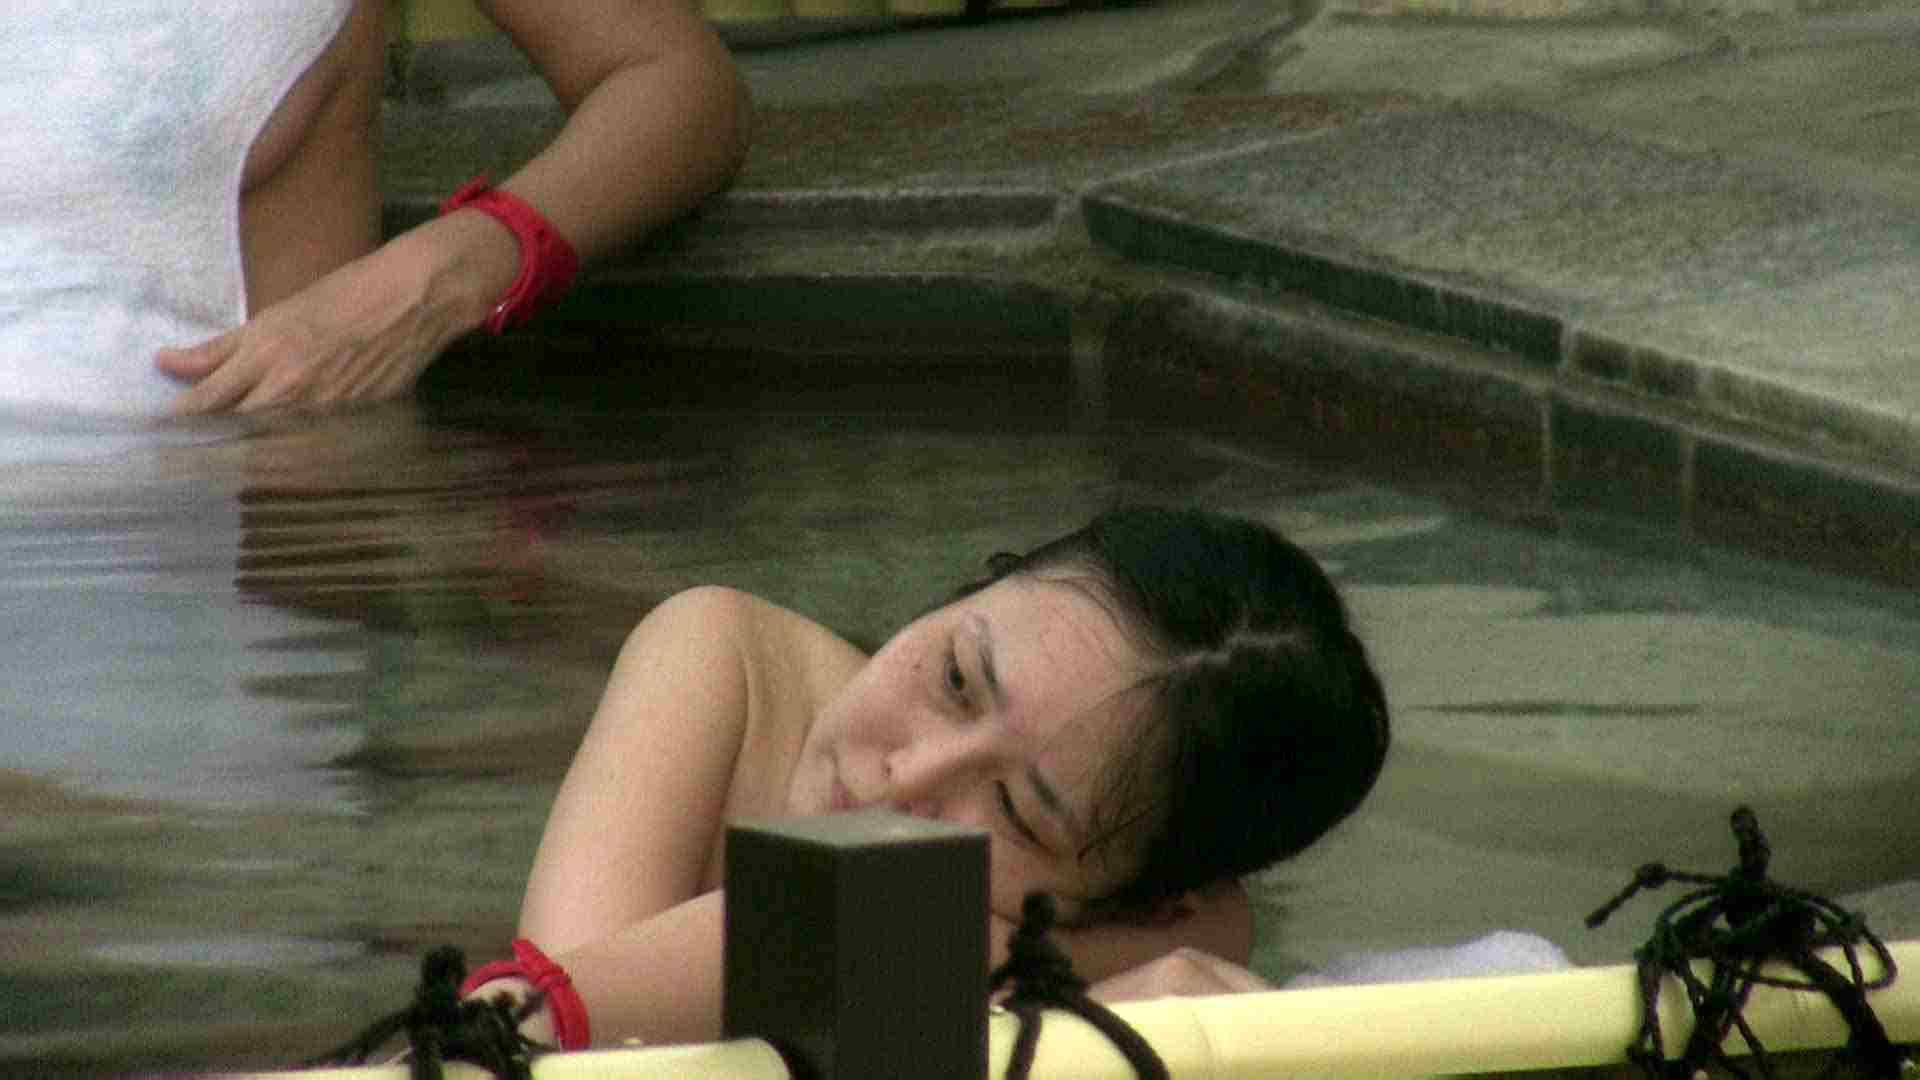 Aquaな露天風呂Vol.636 OL女体 | 露天  87連発 10